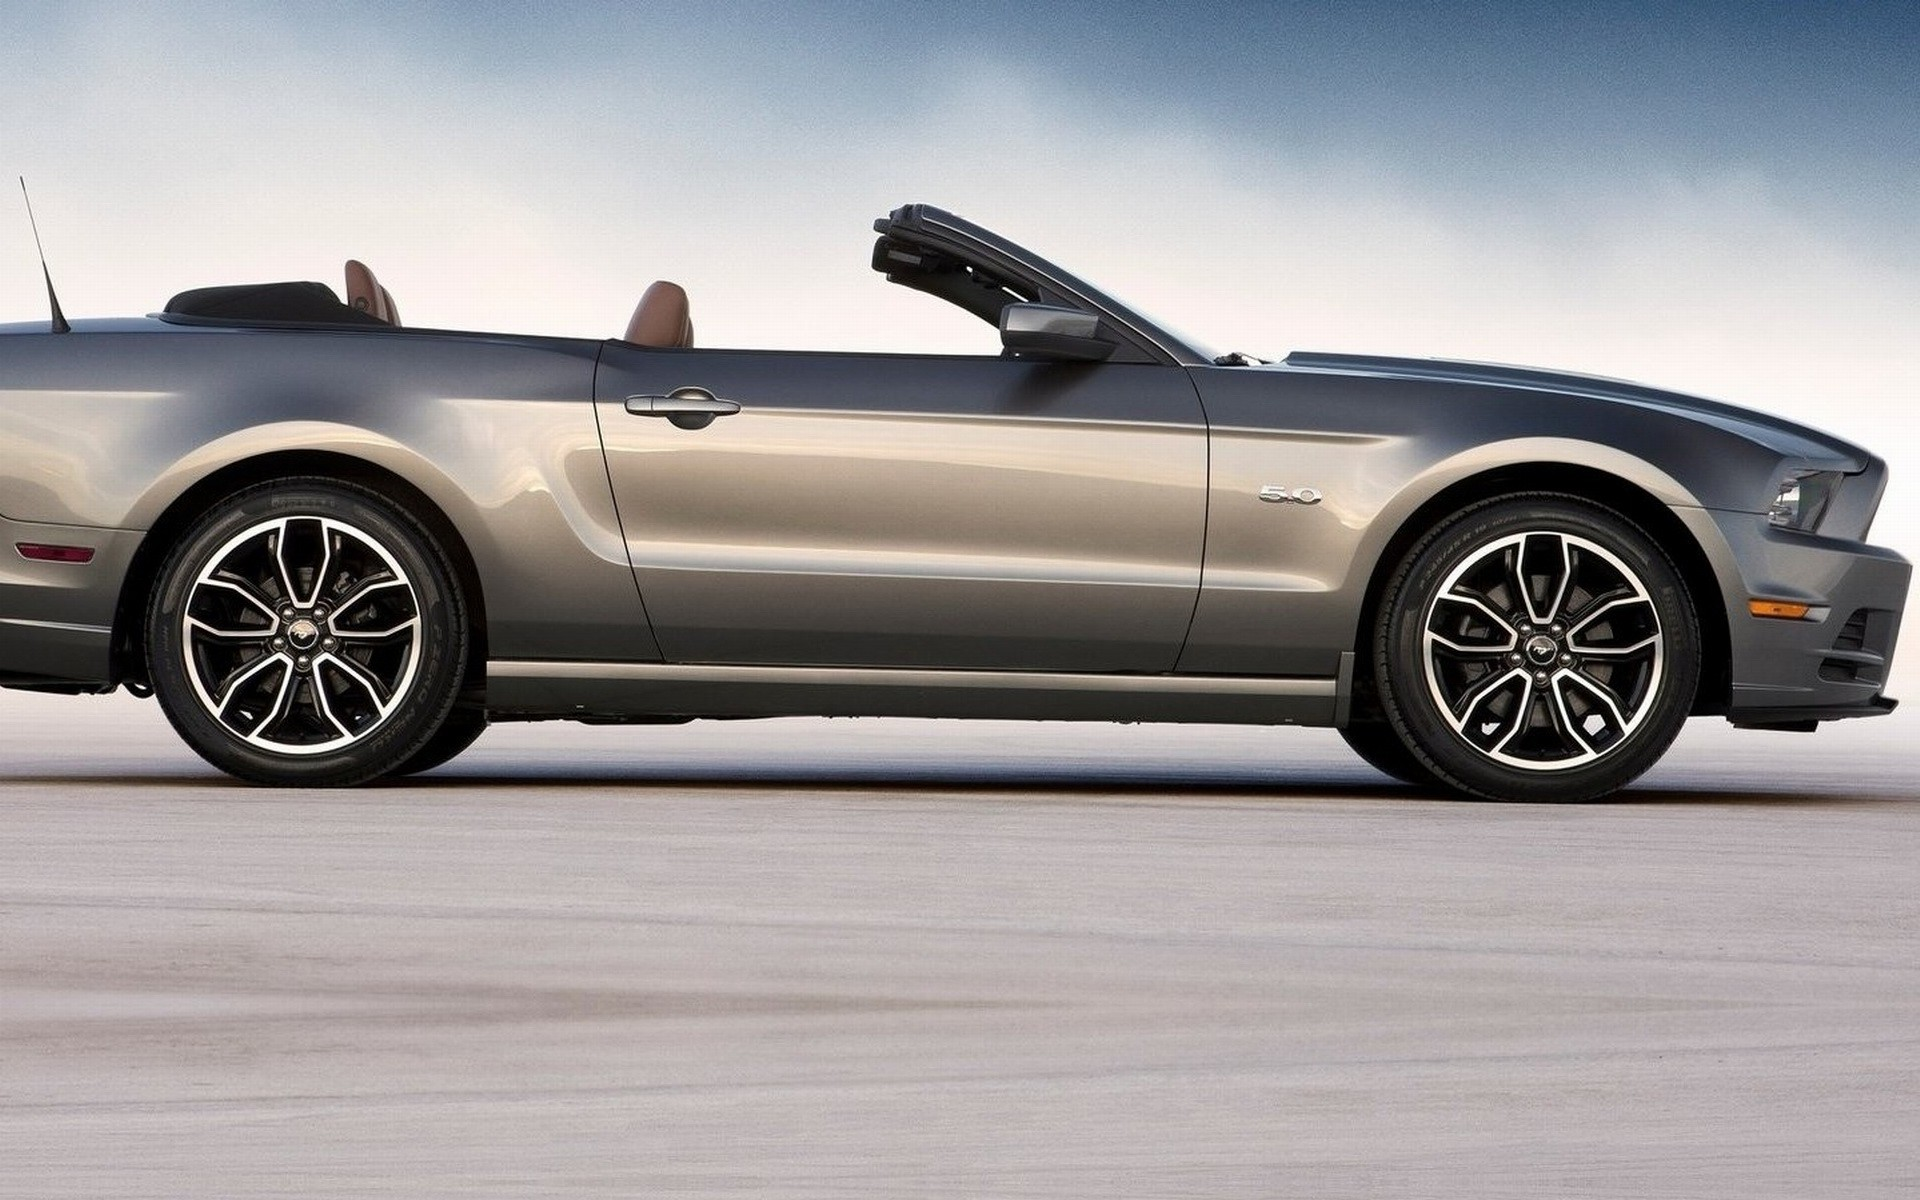 Mustang GT 2013 1920x1200 WallpapersFord Mustang 1920x1200 Wallpapers 1920x1200